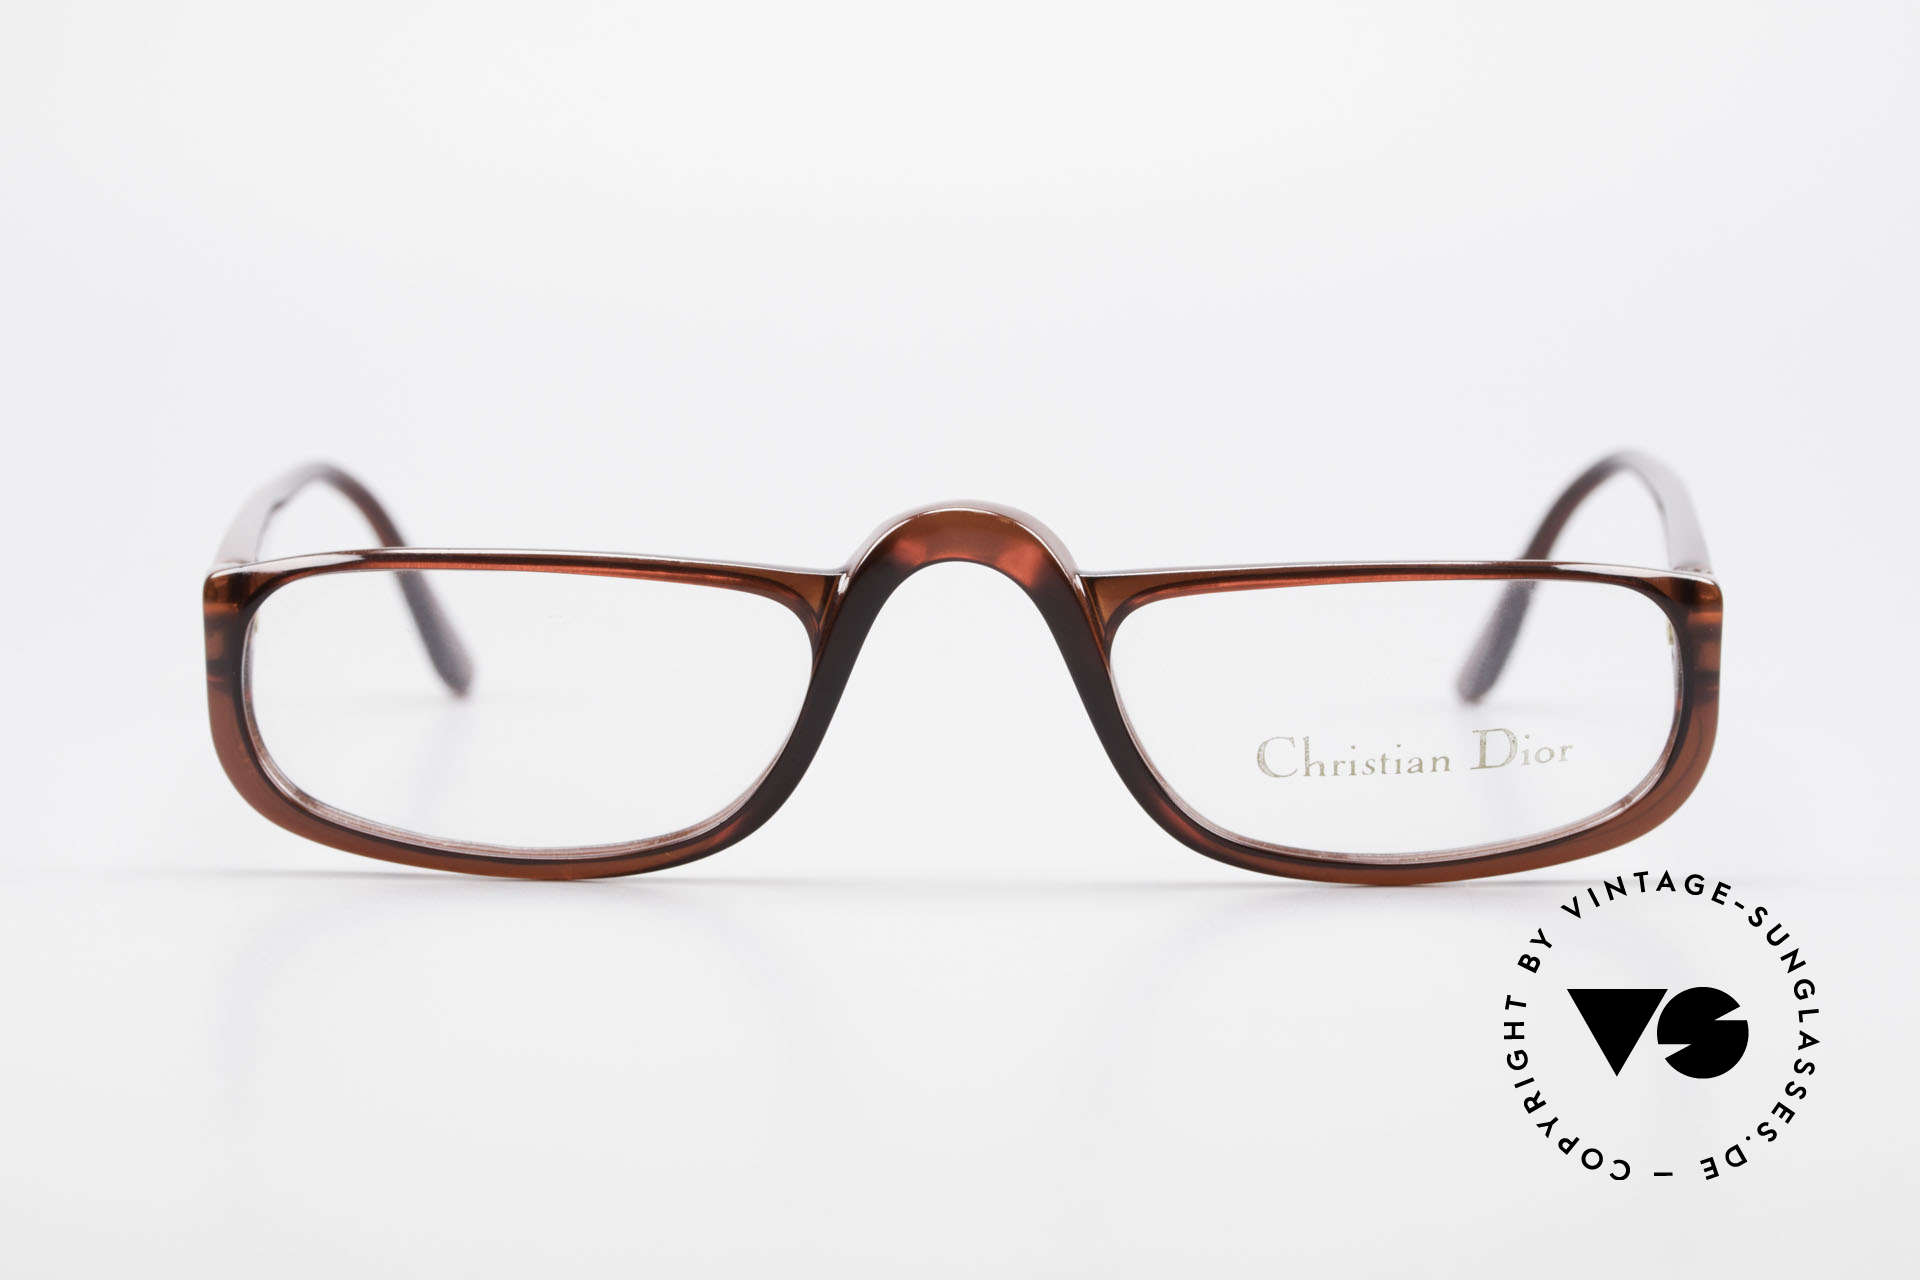 Christian Dior 2075 Reading Glasses Large Optyl, lightweight half-frame design; ergonomically correct, Made for Men and Women